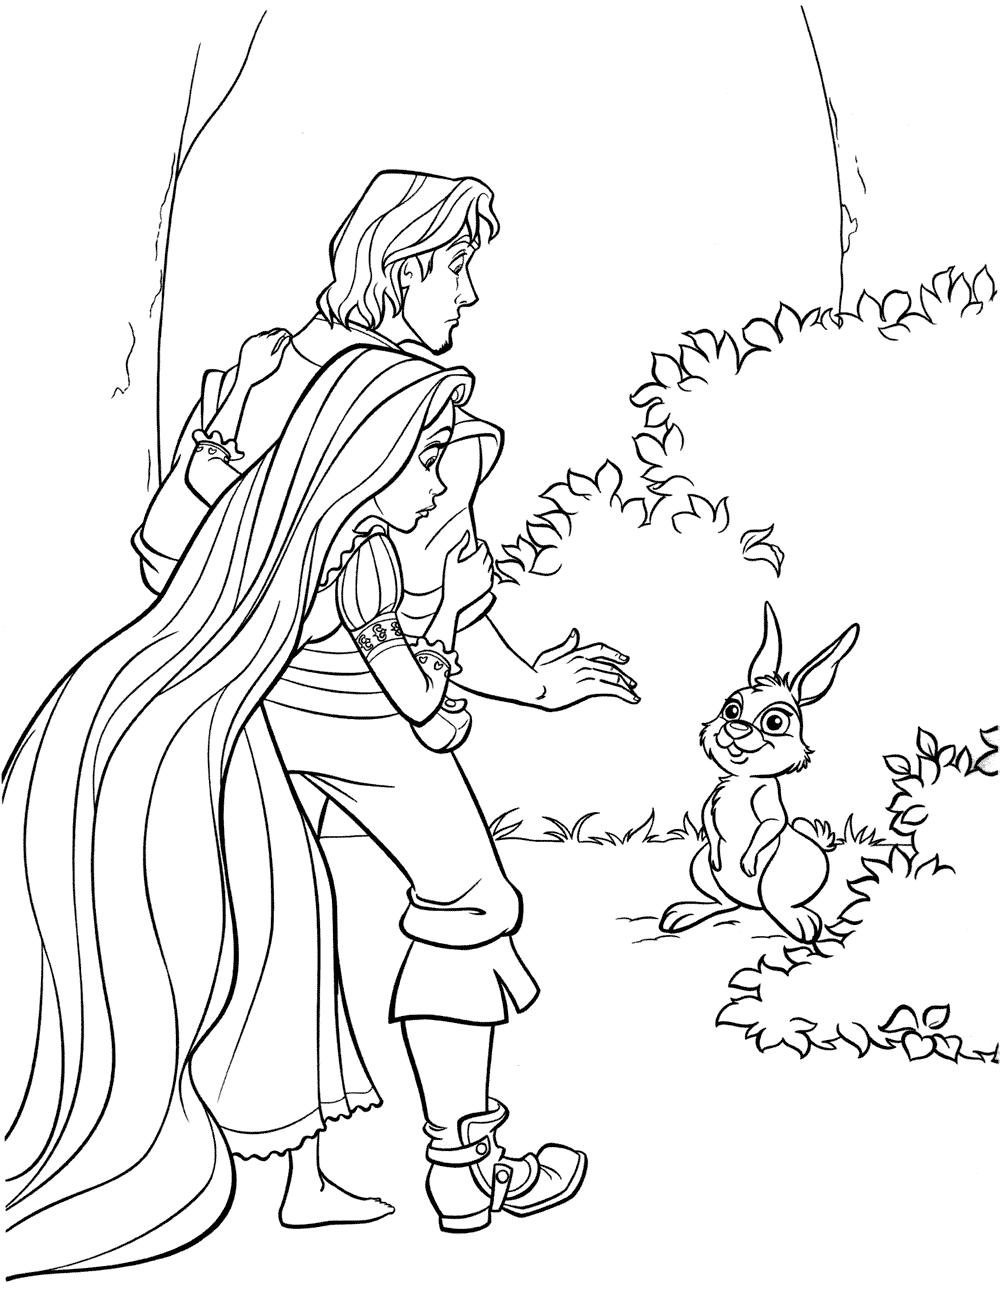 Ausmalbilder Rapunzel Maximus : Ausmalbilder F R Kinder Flynn